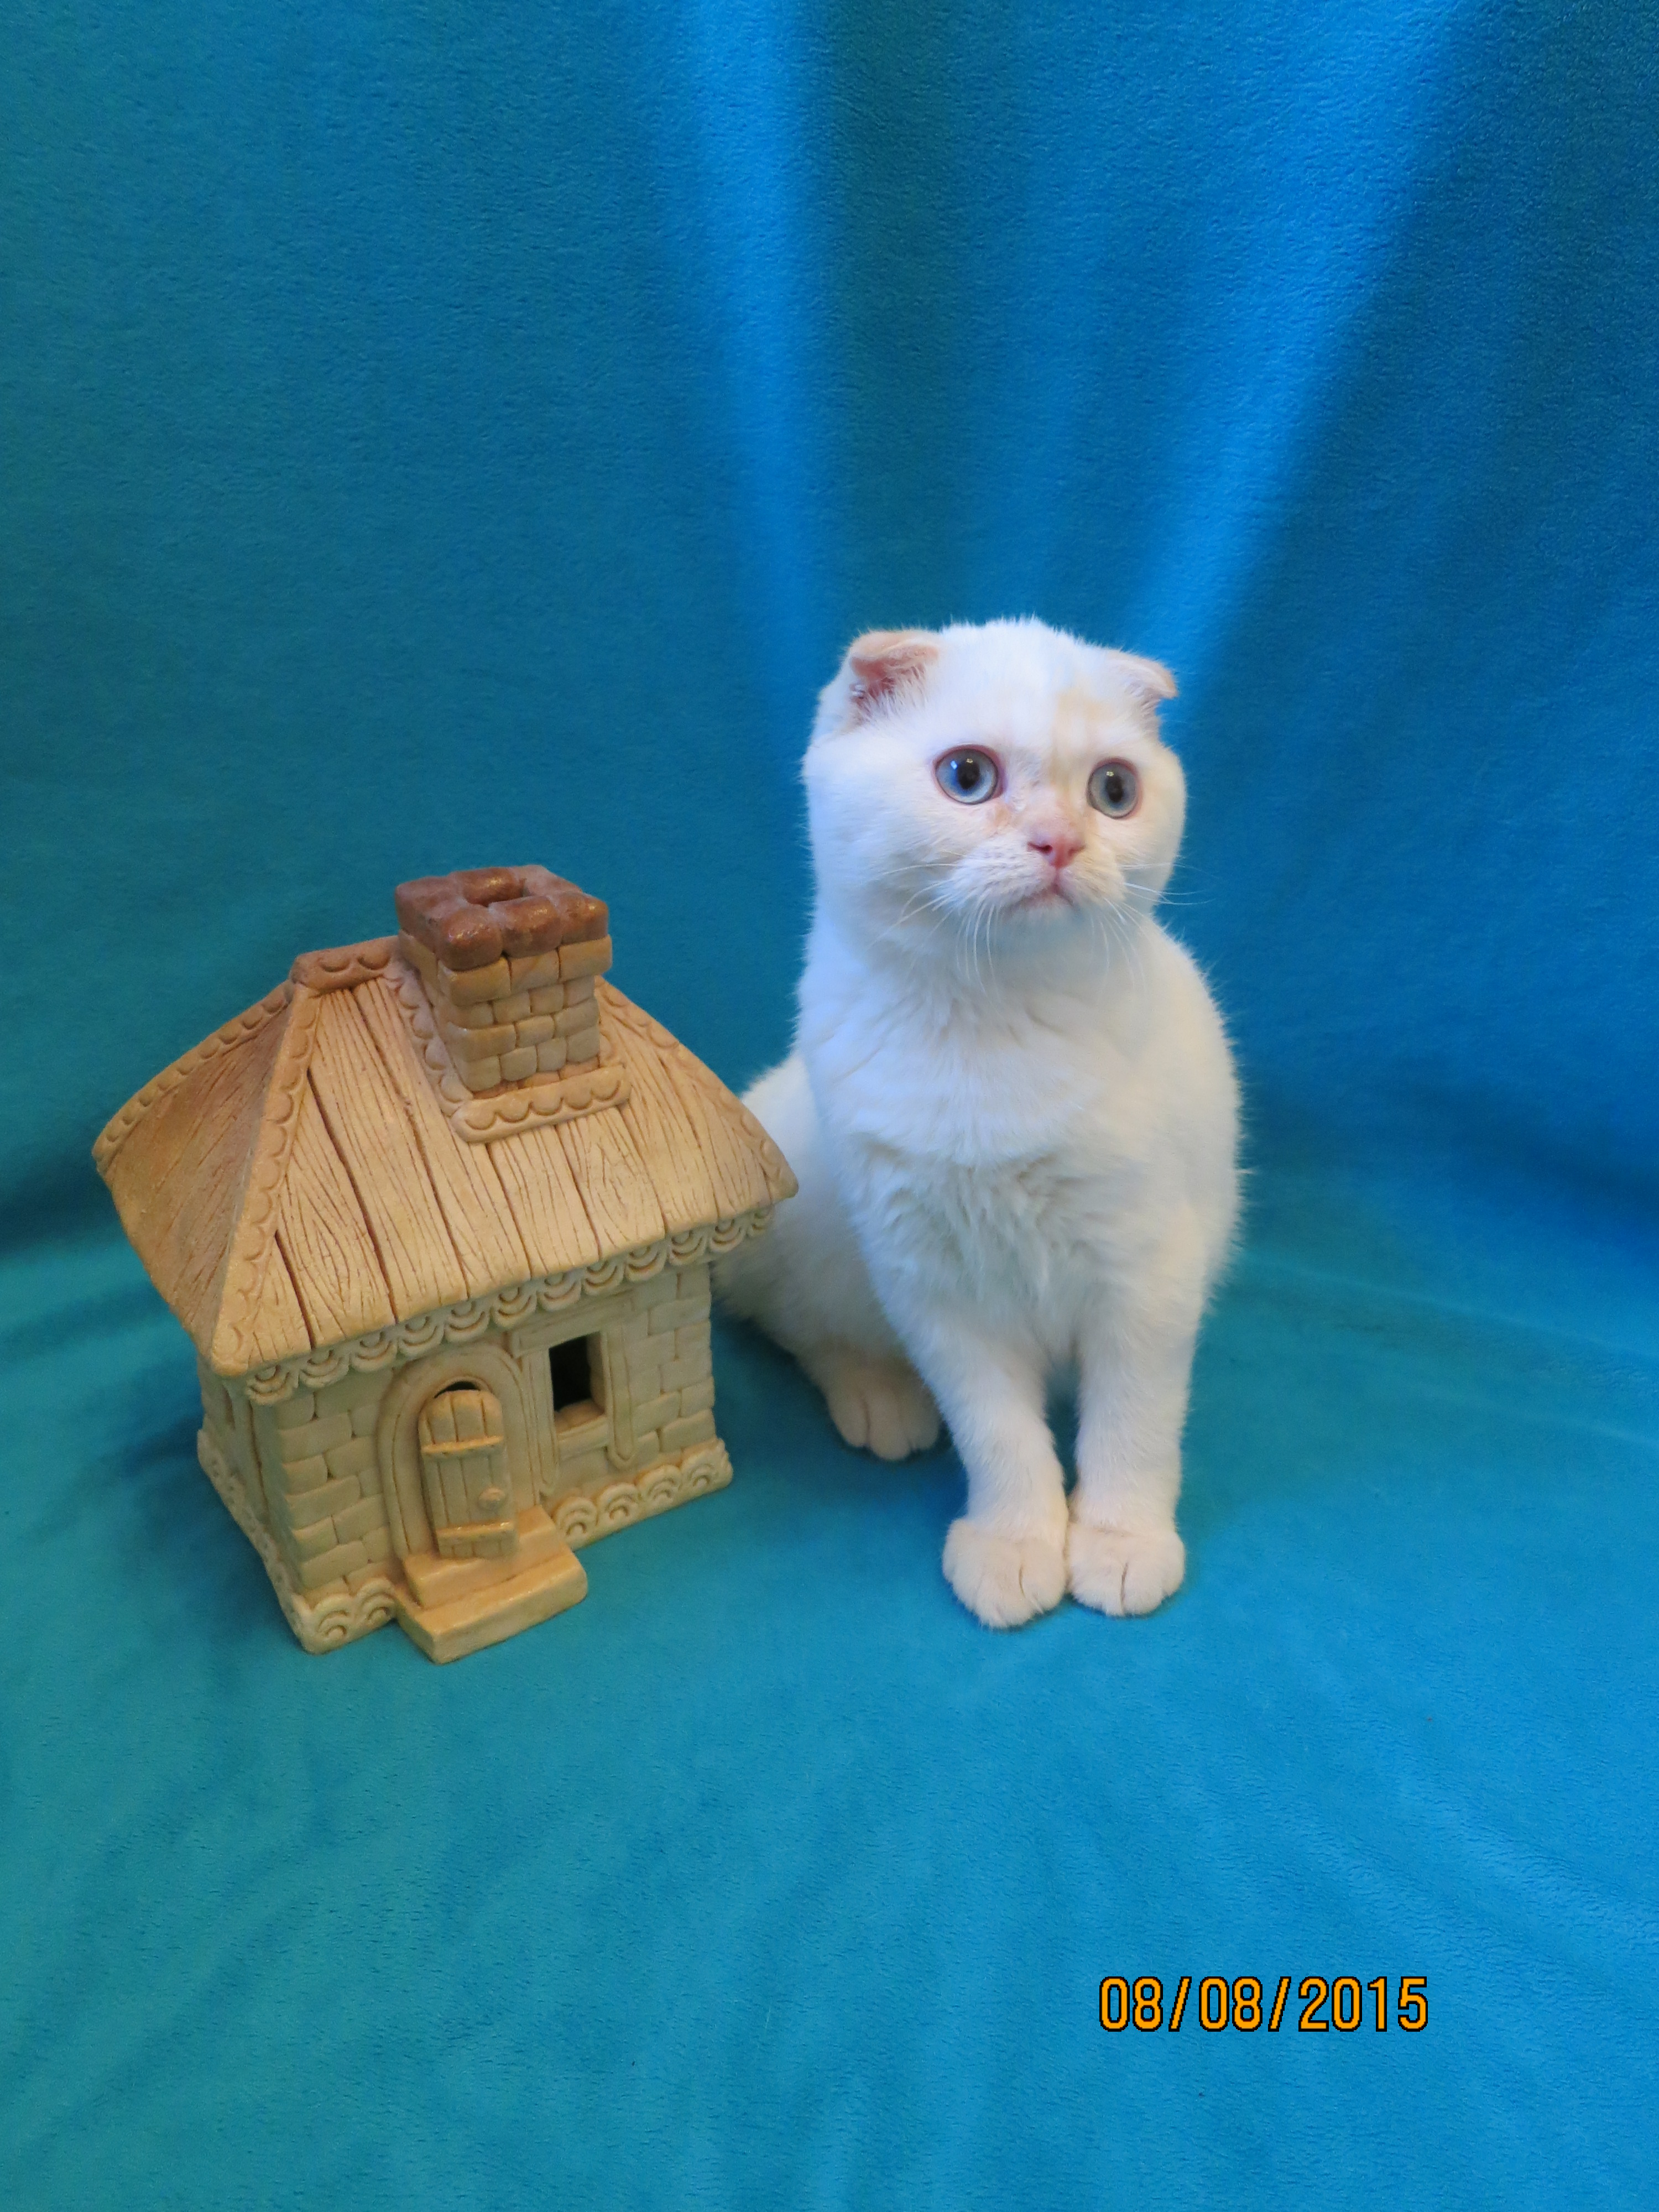 http://belfastcats.ucoz.net/IMG_2167.jpg